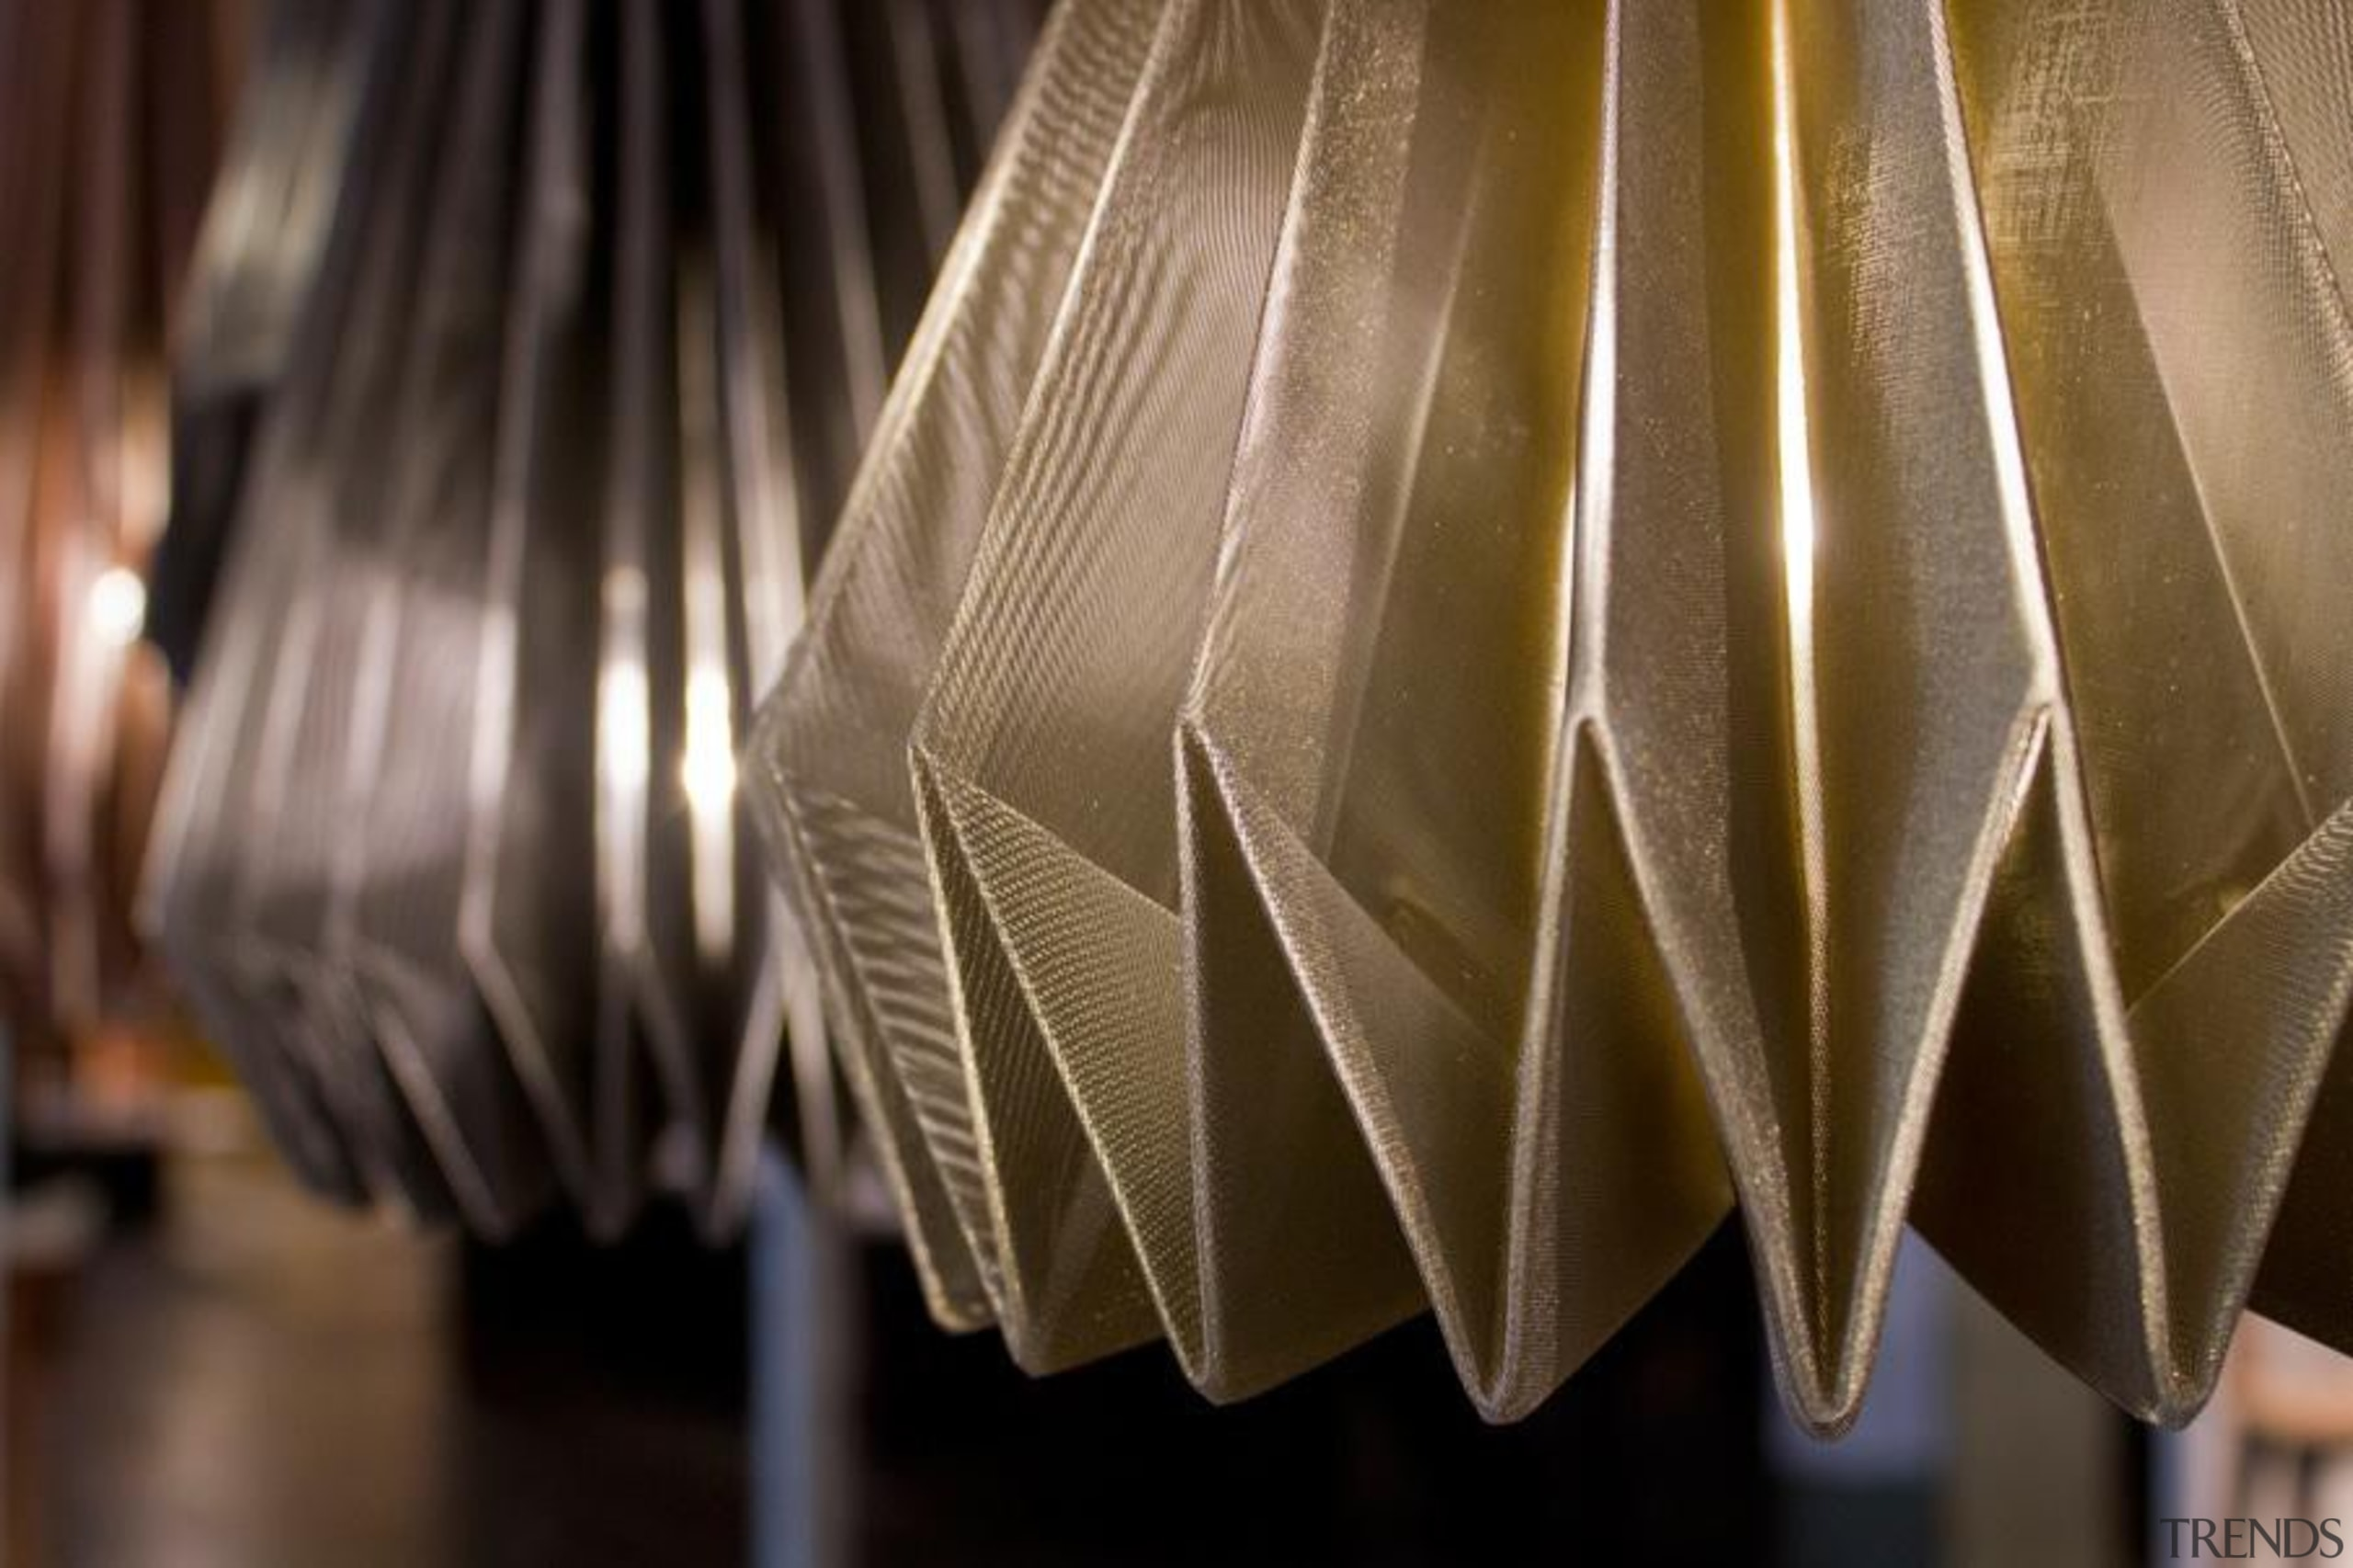 A range of folded metallic fabrics  are interior design, lampshade, light, light fixture, lighting, lighting accessory, material, brown, black